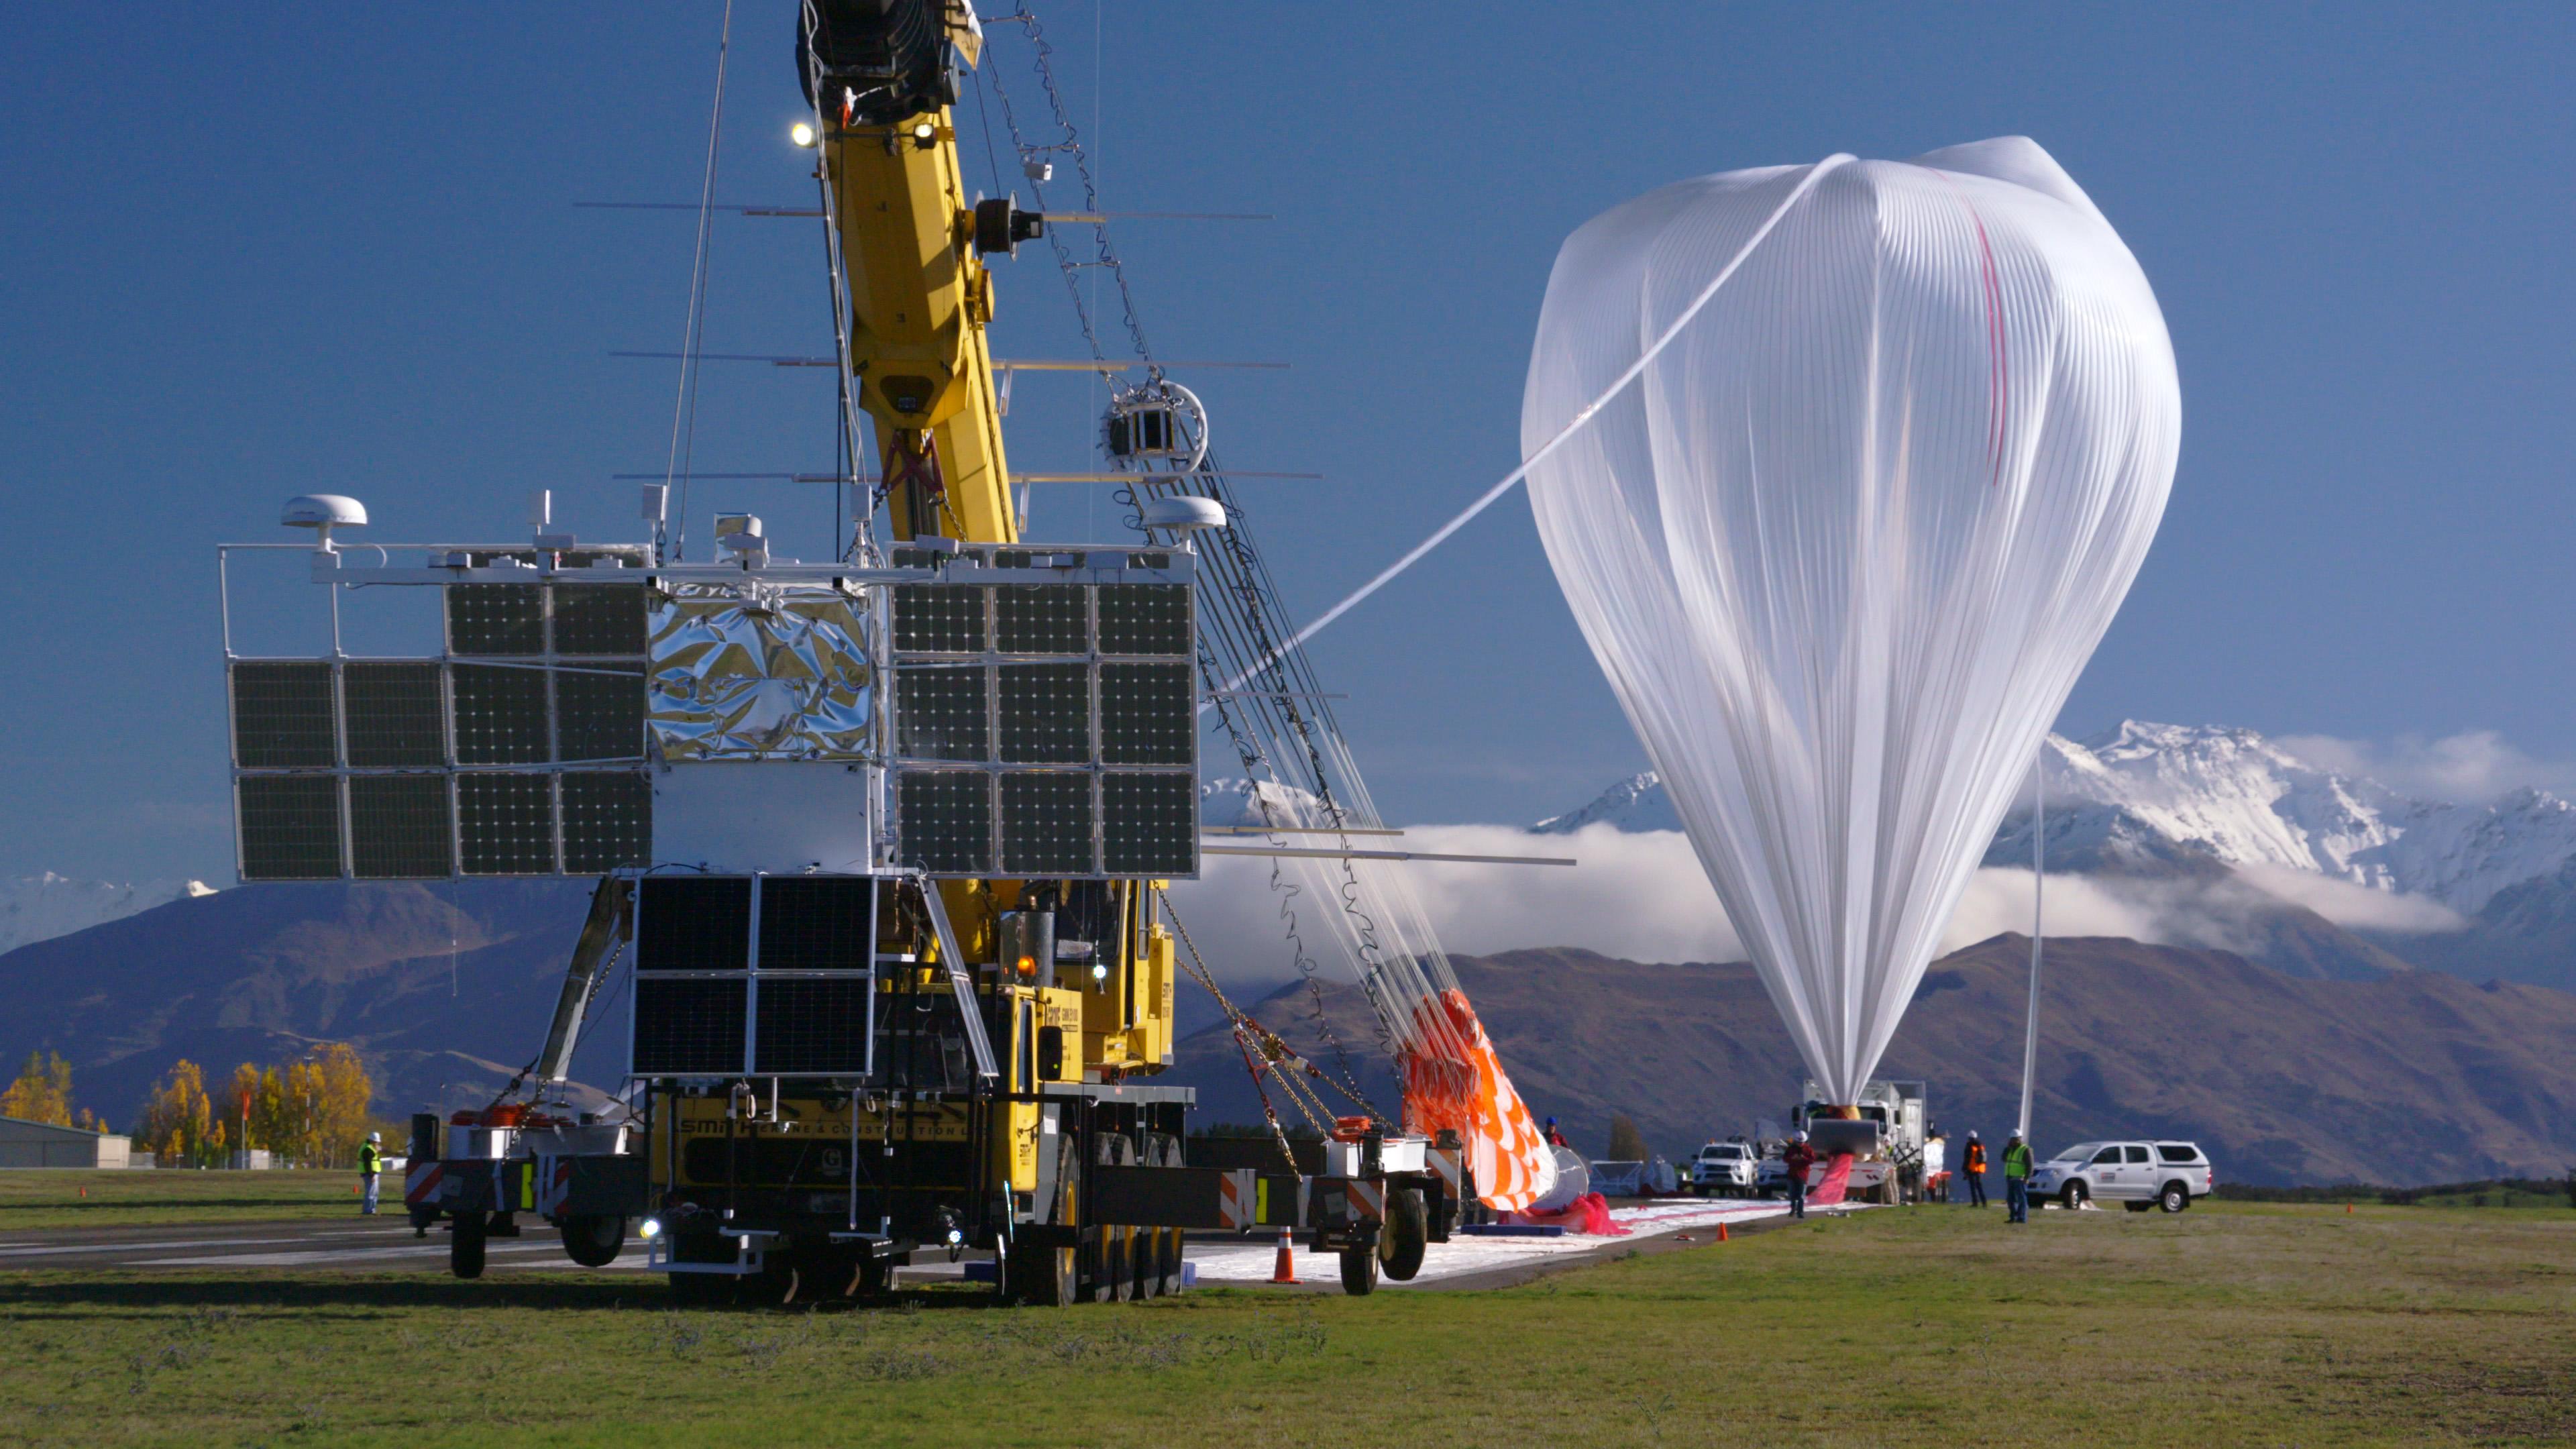 NASA Super Pressure Balloon Begins Globetrotting Journey | NASA